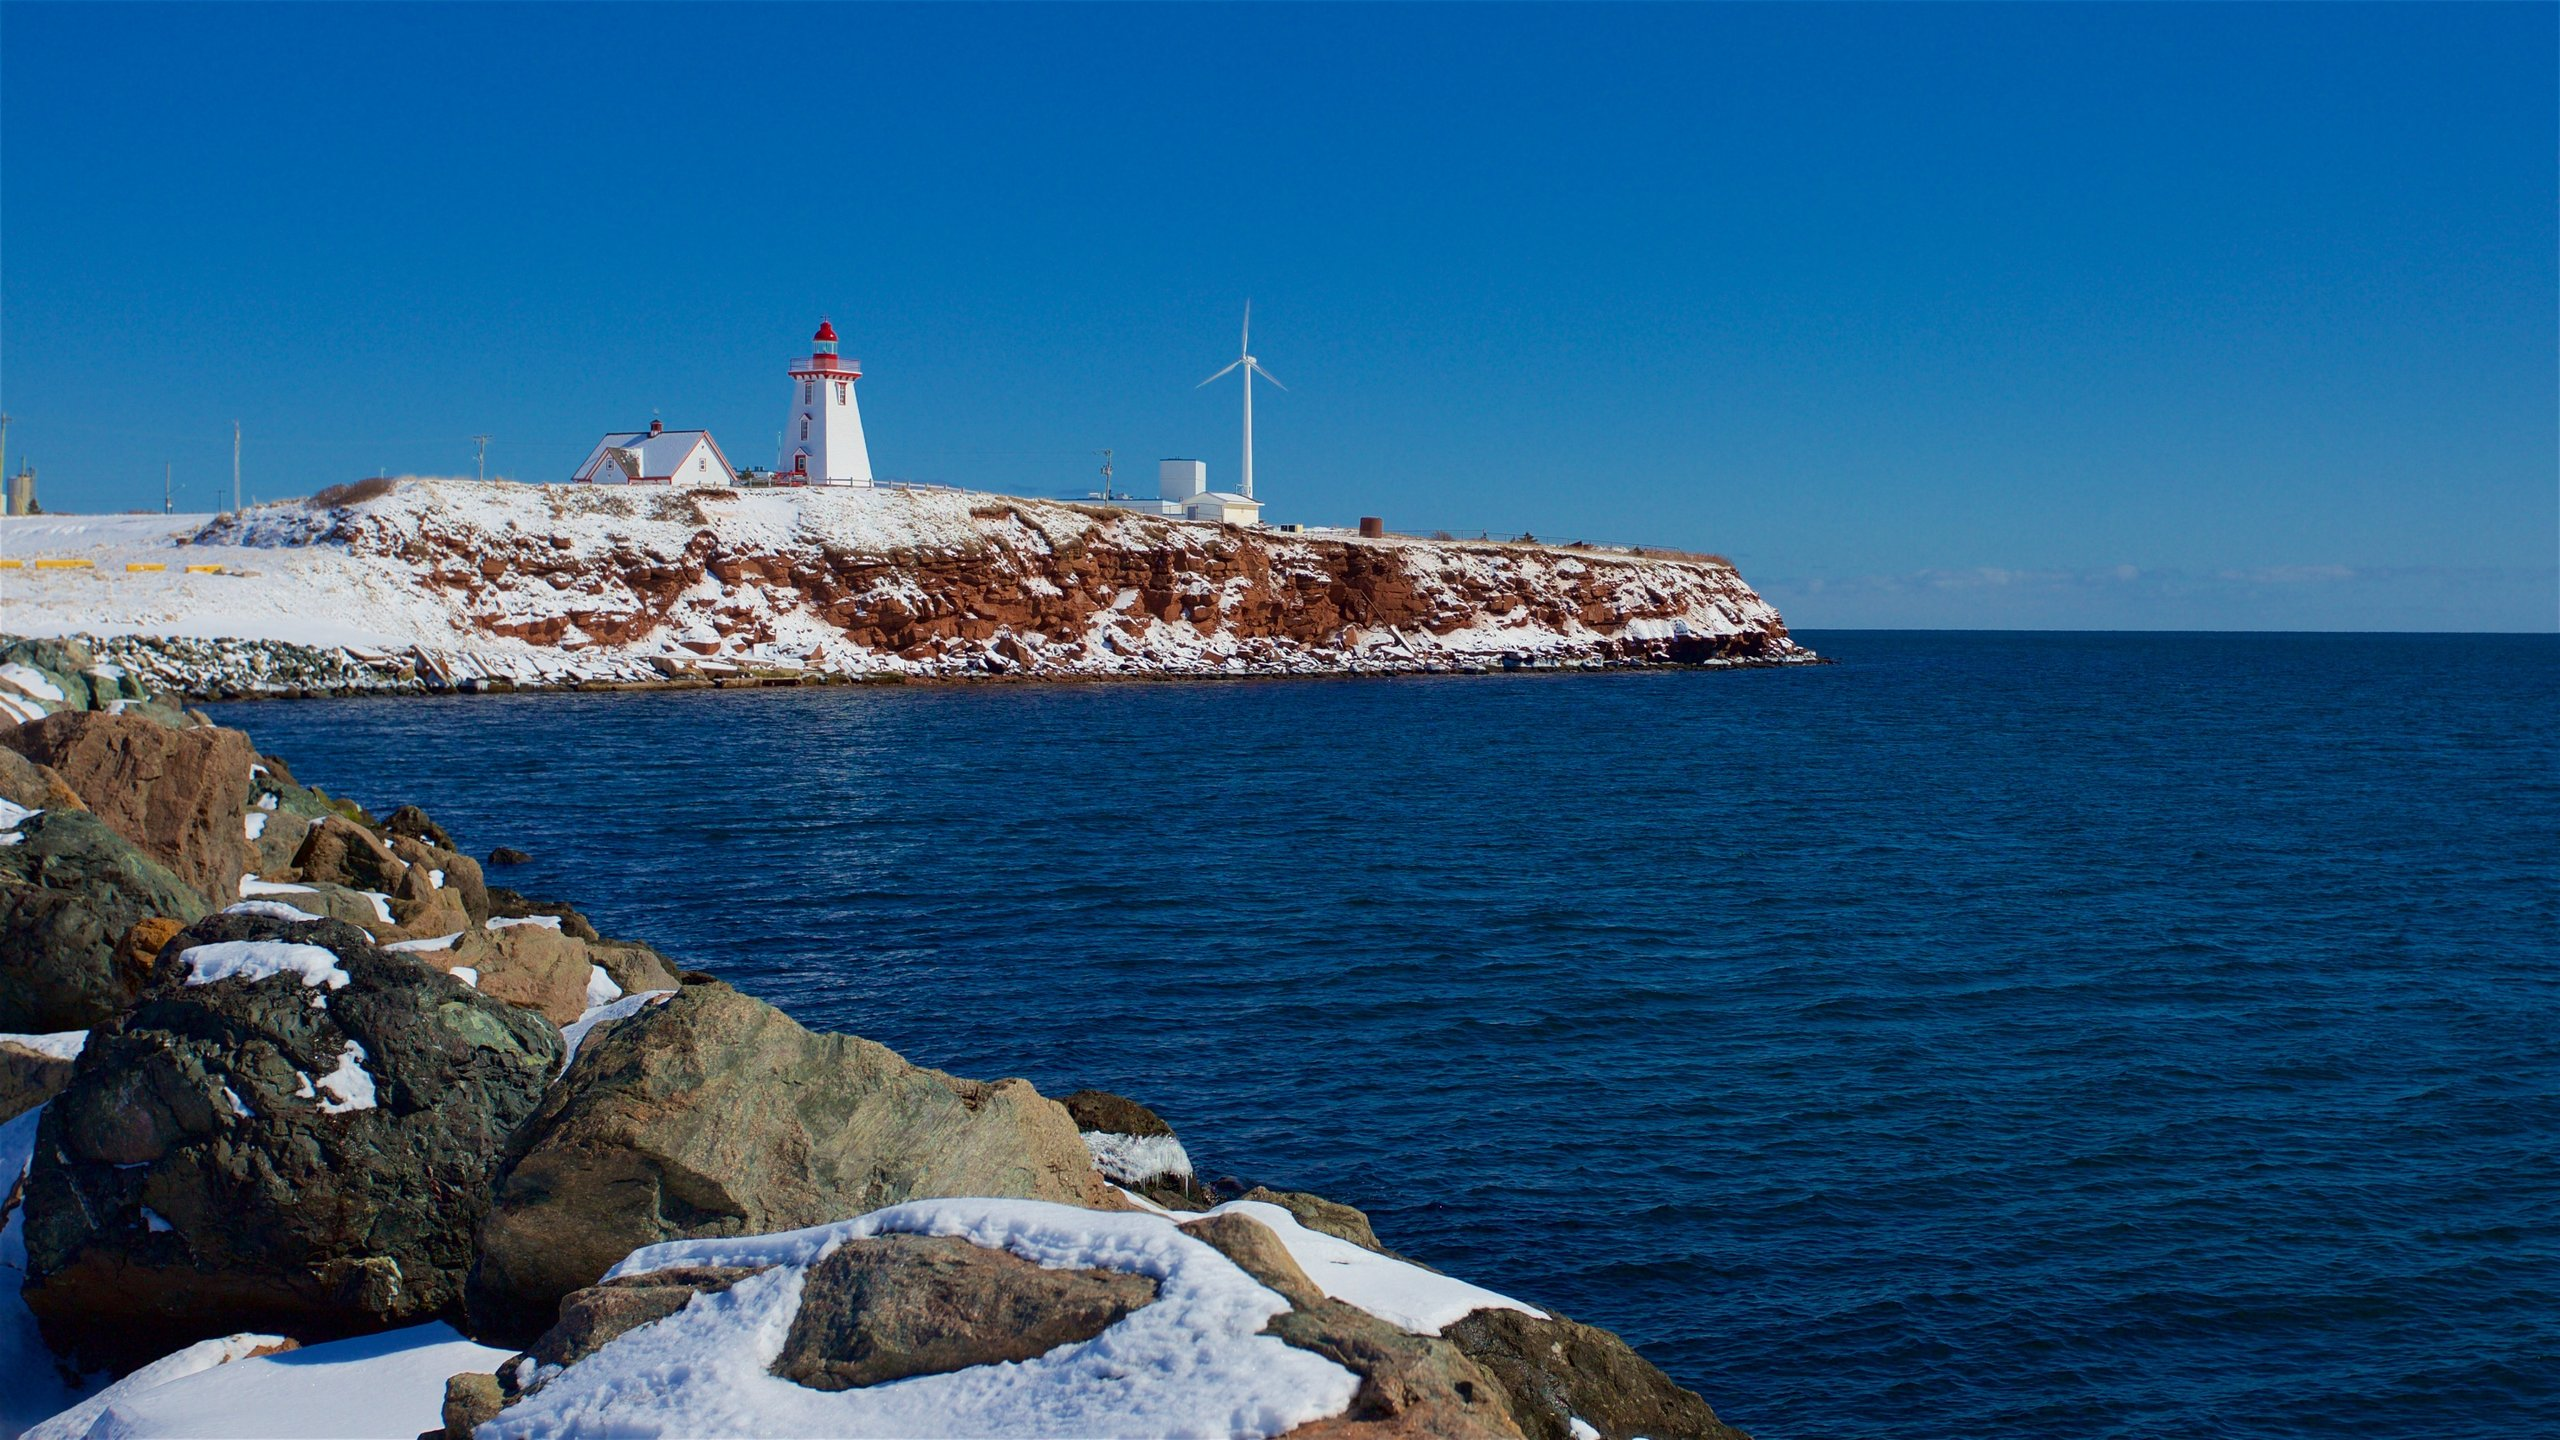 Souris, Prince Edward Island, Canada